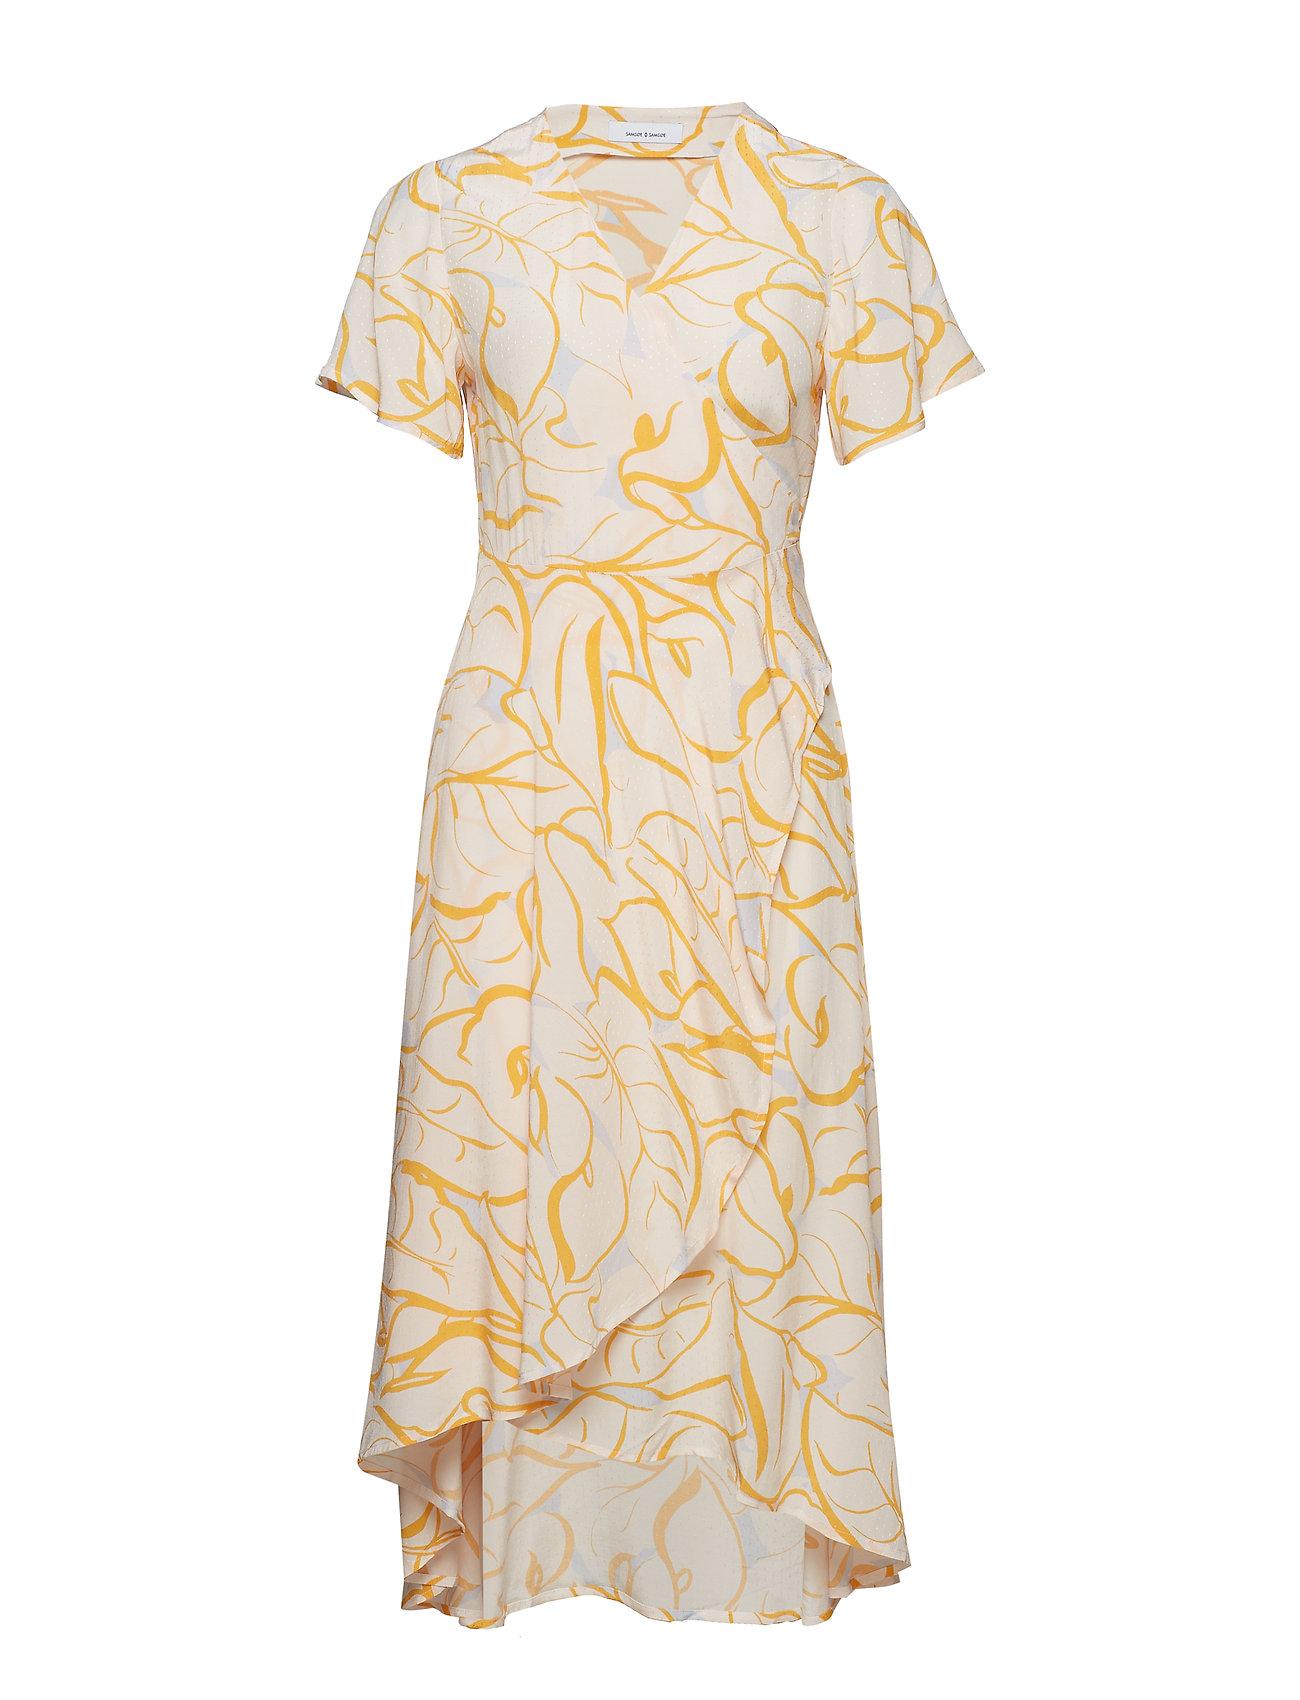 Veneto 10458waterlilySamsøeamp; Dress Dress Aop Aop 10458waterlilySamsøeamp; Veneto Dress Aop 10458waterlilySamsøeamp; Veneto eDHEIW2Y9b